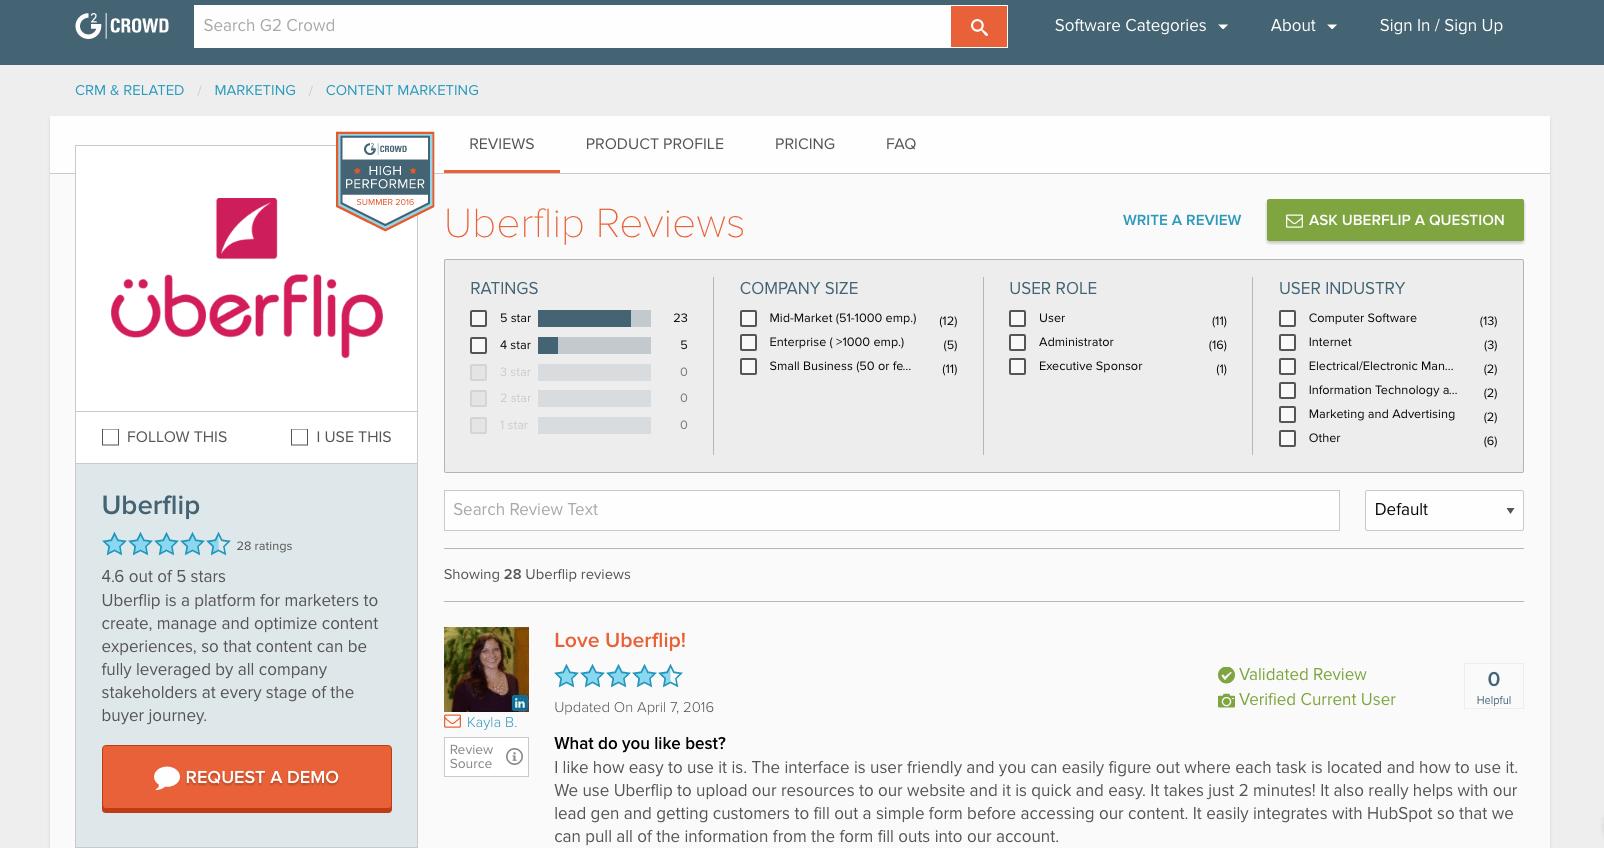 content marketing tools: Uberflip